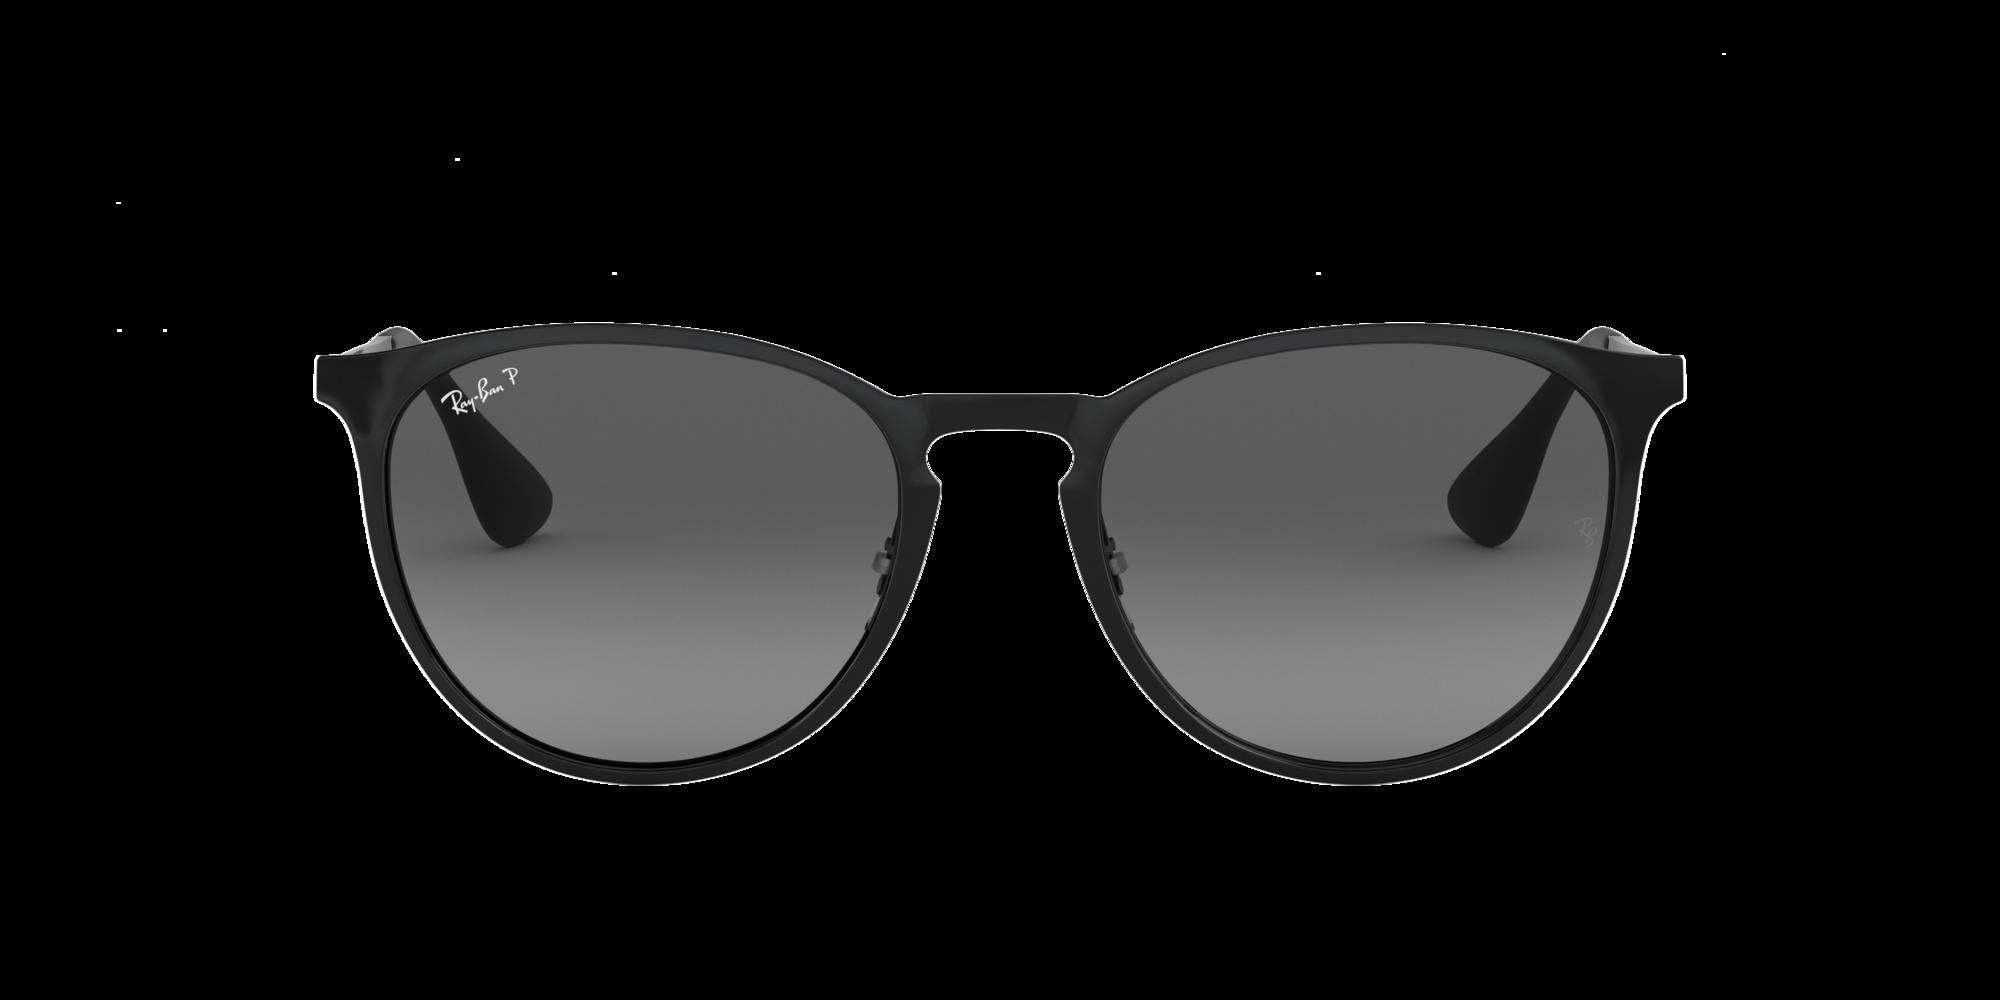 Image for RB3539 54 ERIKA METAL from LensCrafters | Glasses, Prescription Glasses Online, Eyewear